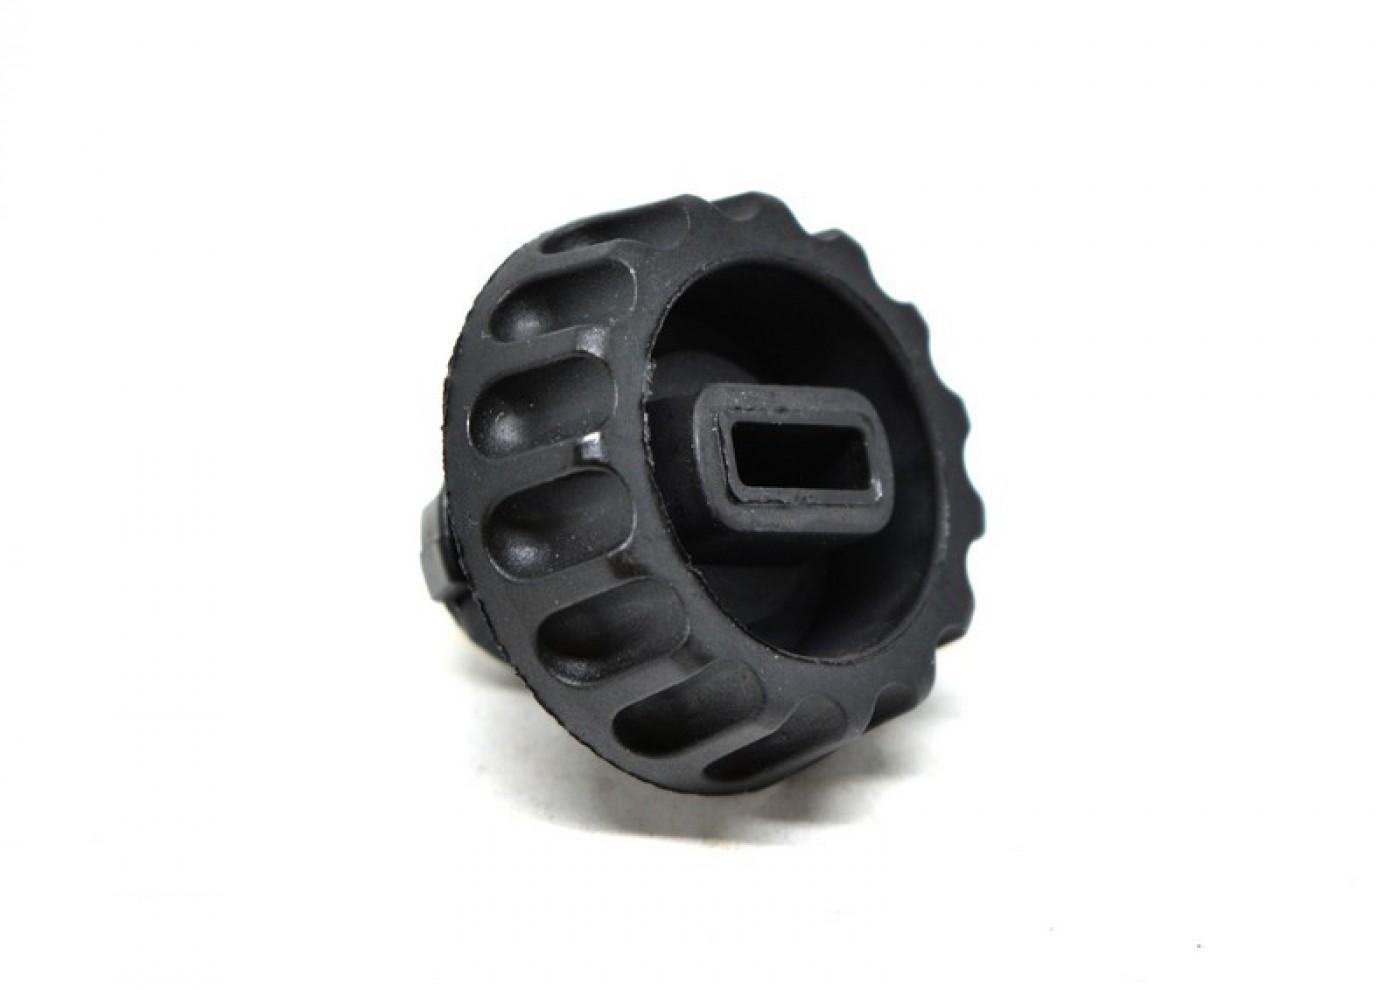 Zátka krytu vzduchového filtru Stihl MS361